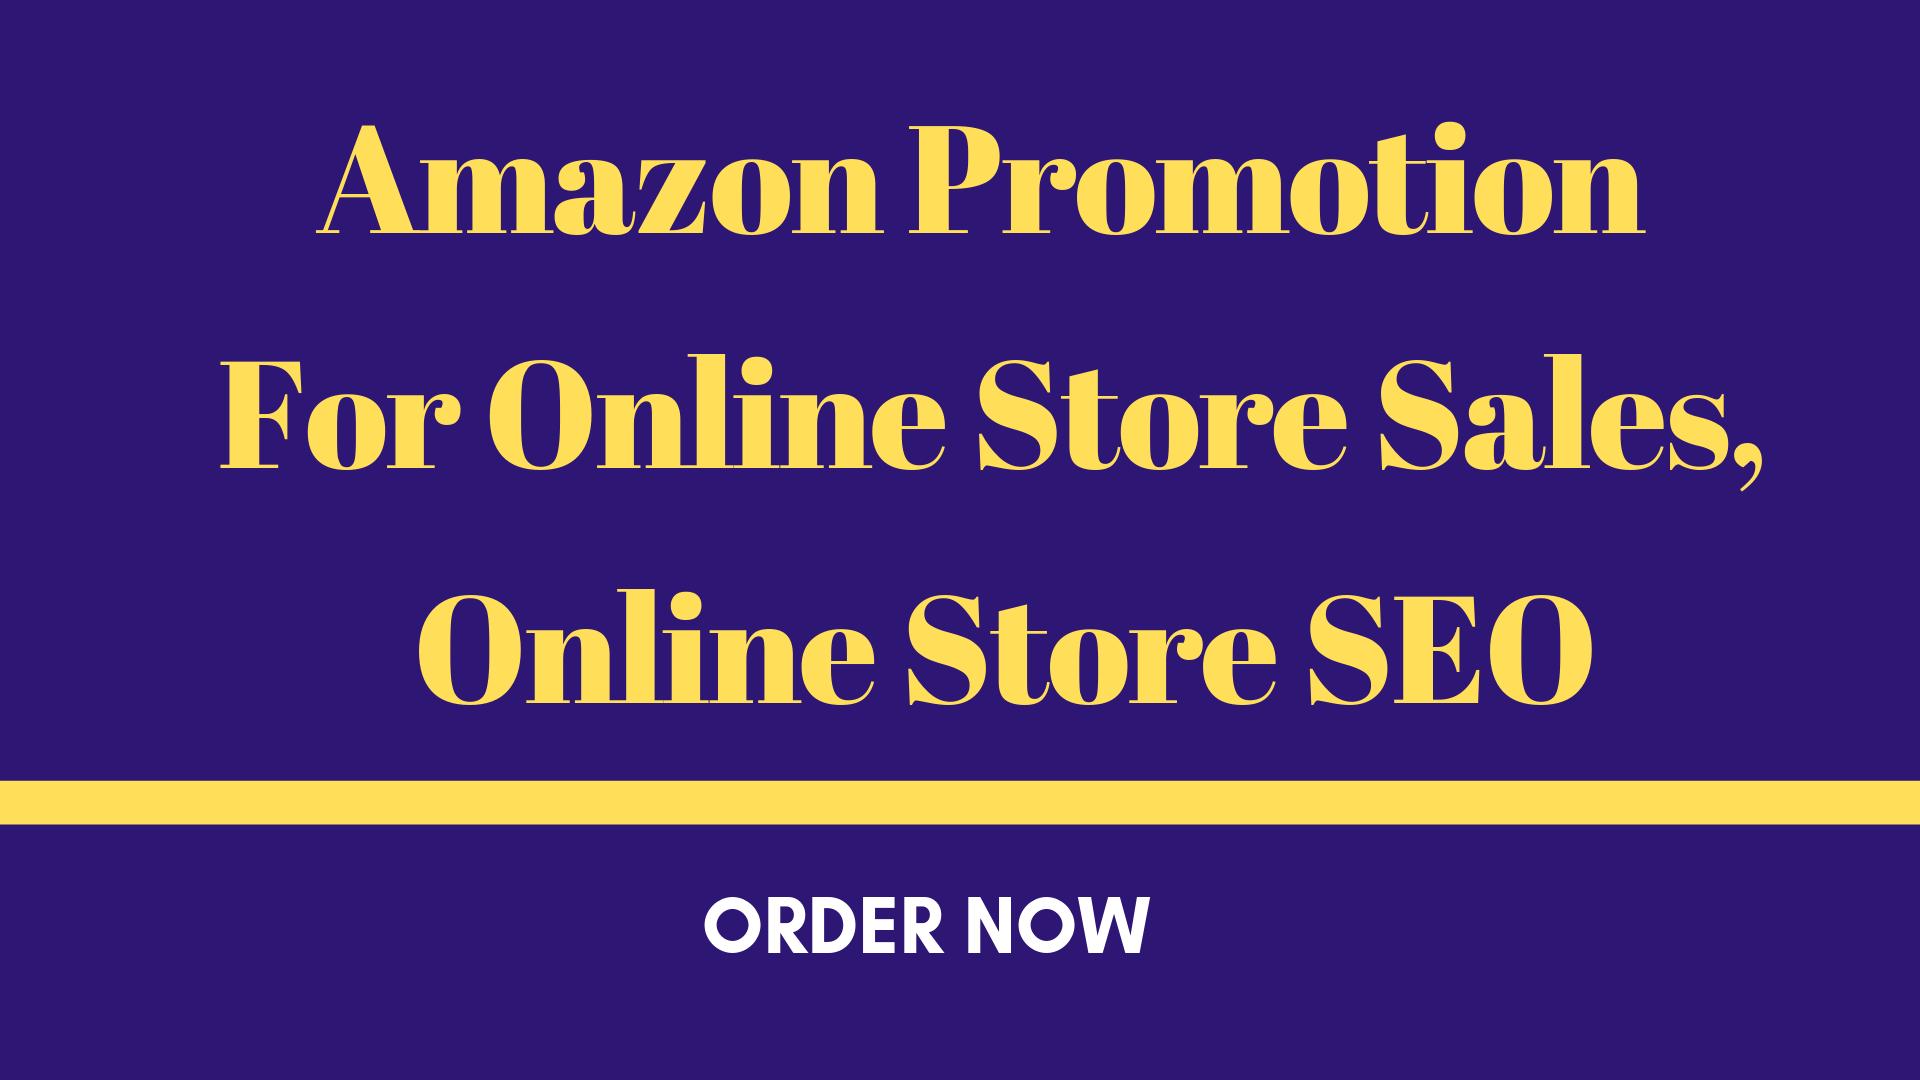 provide 1,000,000 SEO backlinks for amazon promotion